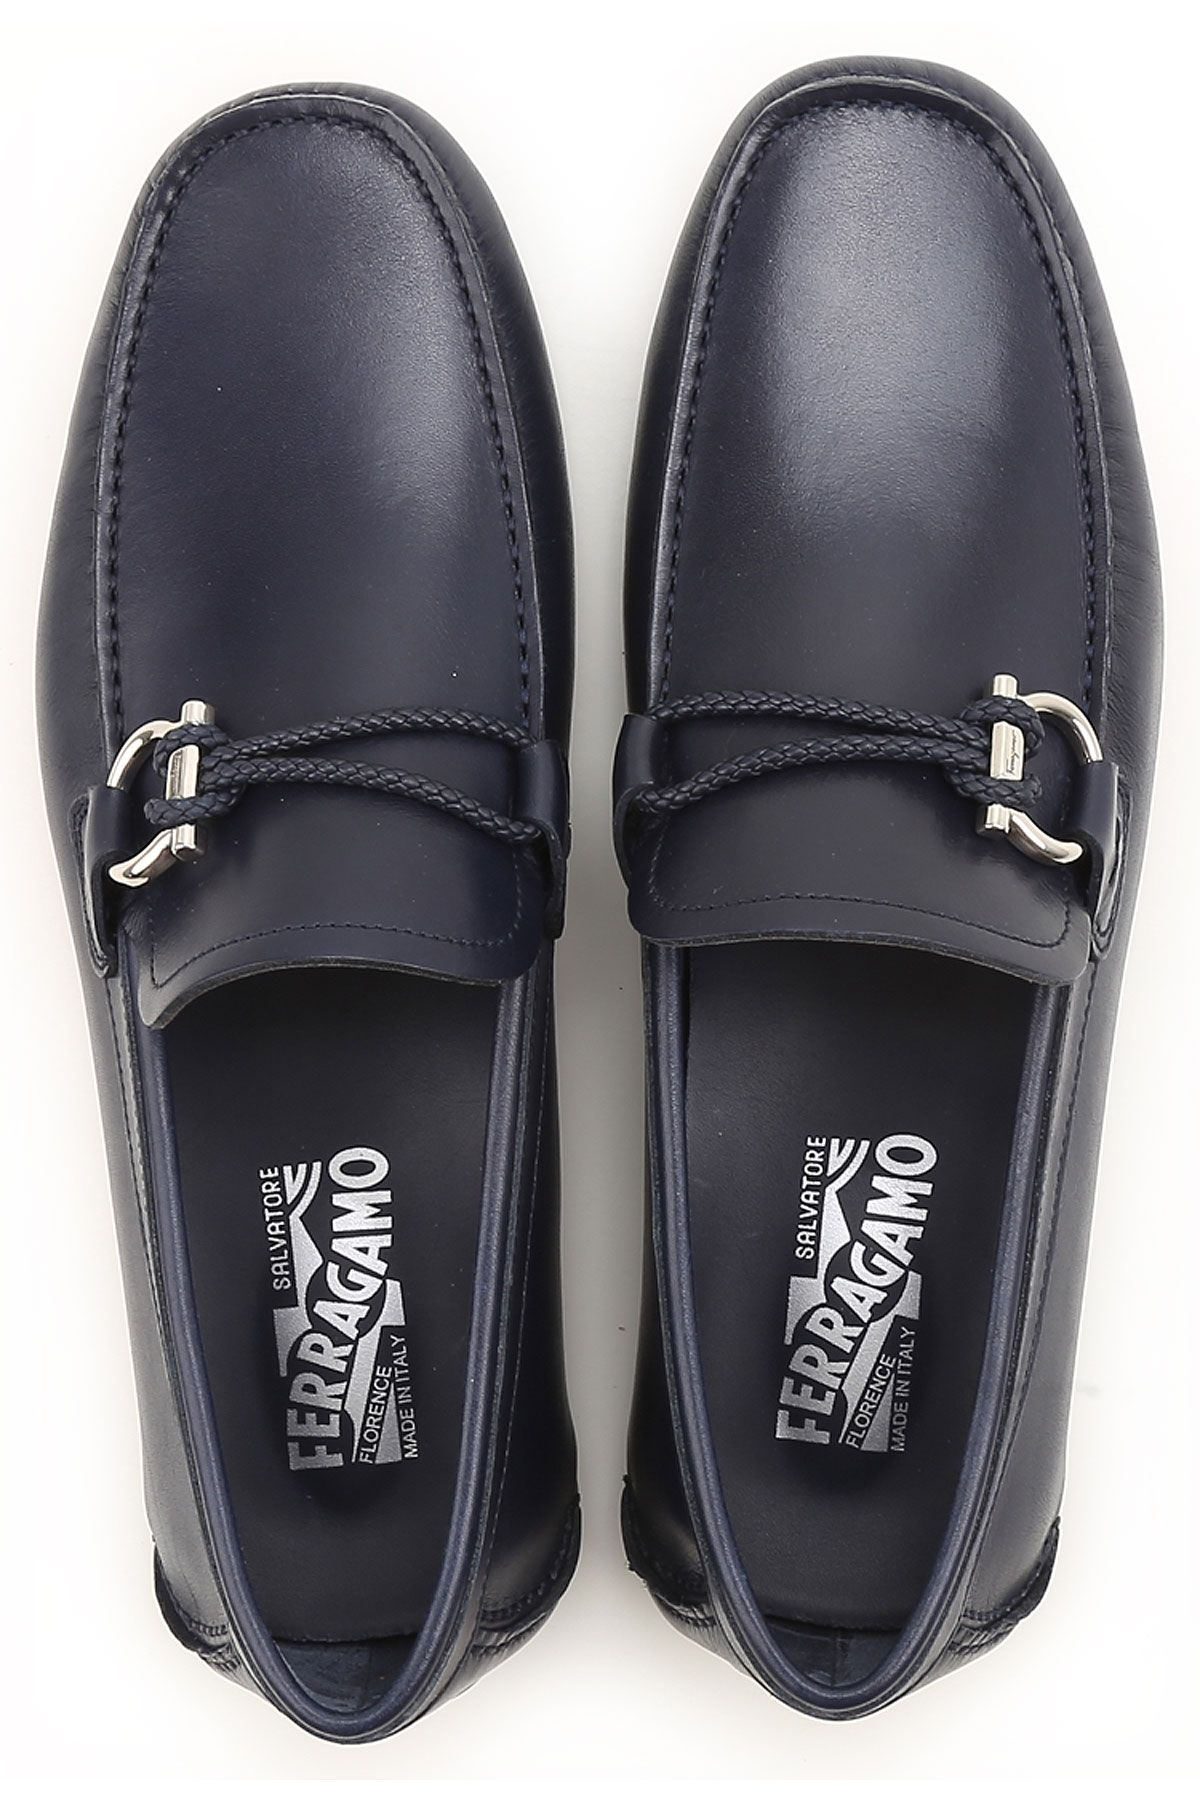 Ferragamo shoes mens, Dress shoes men